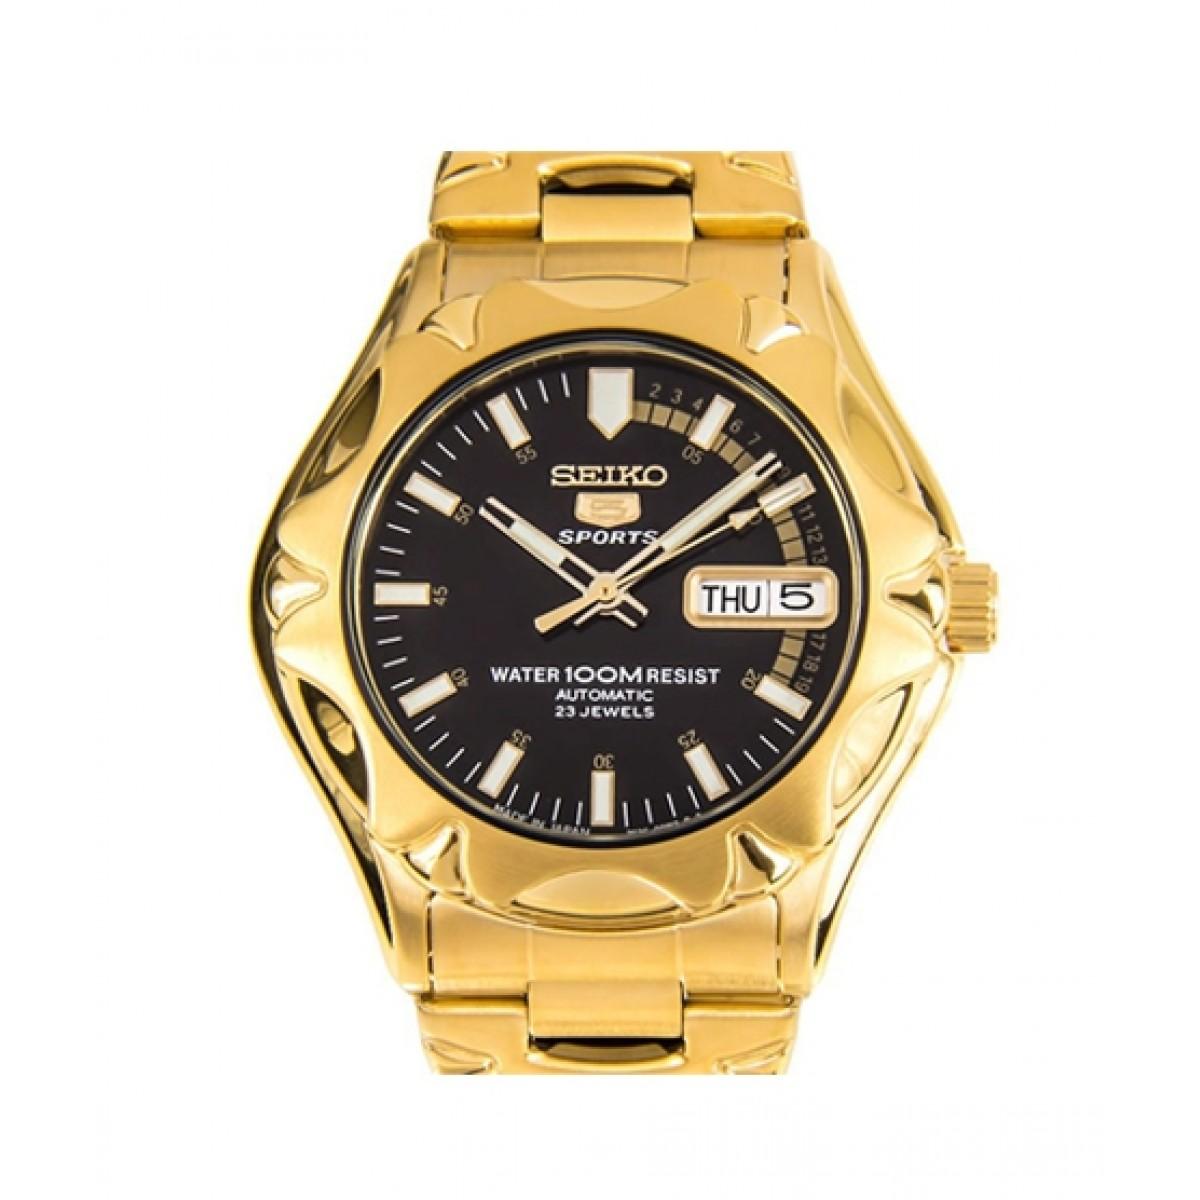 21524bac4 Seiko 5 Sports Men's Watch Gold Price in Pakistan | Buy Seiko Seiko Men's  Watch Gold (SNZ452J1) | iShopping.pk